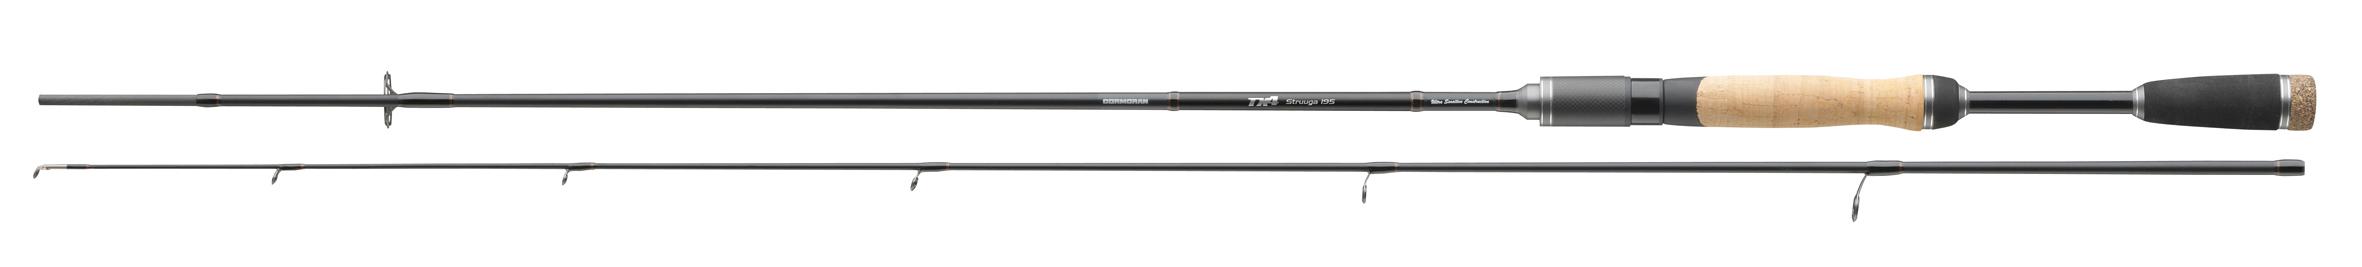 Удилище TX-4 STRUUGA (Cormoran), 1.95м, 4-18г